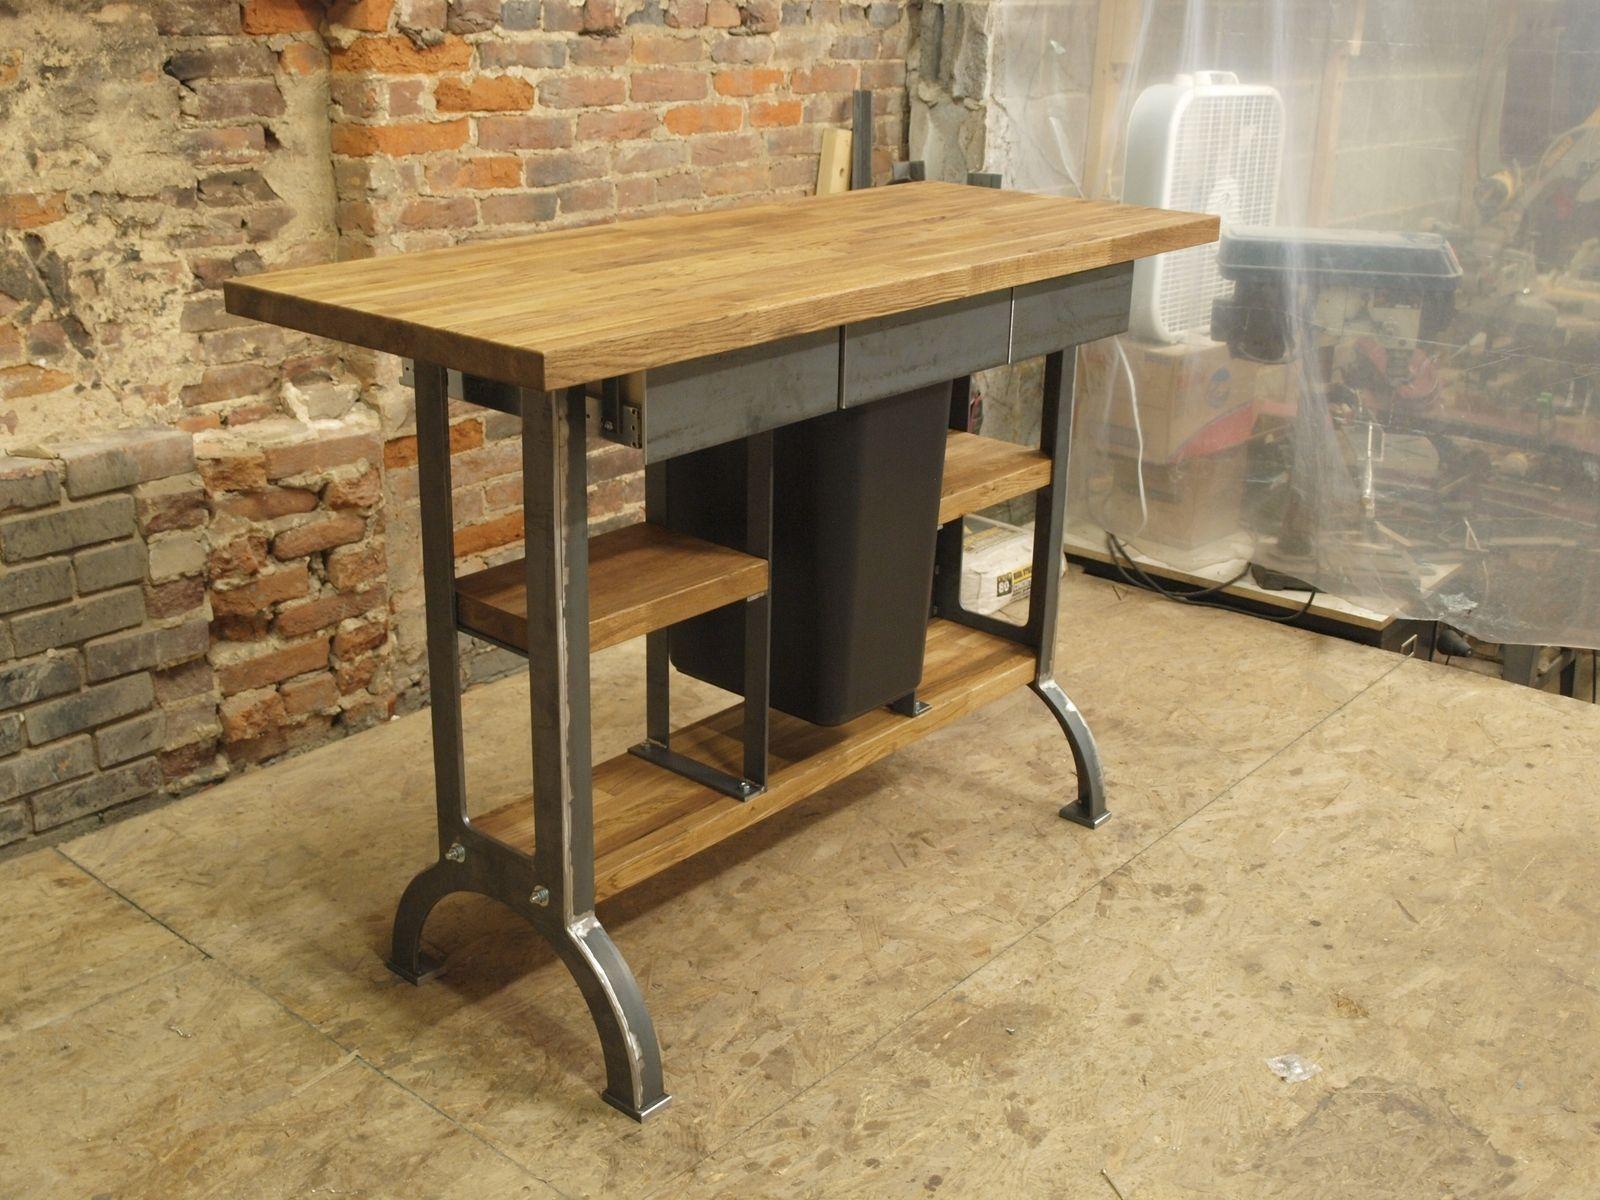 kitchen console table home depot backsplash glass tile modern industrial island brainstorming